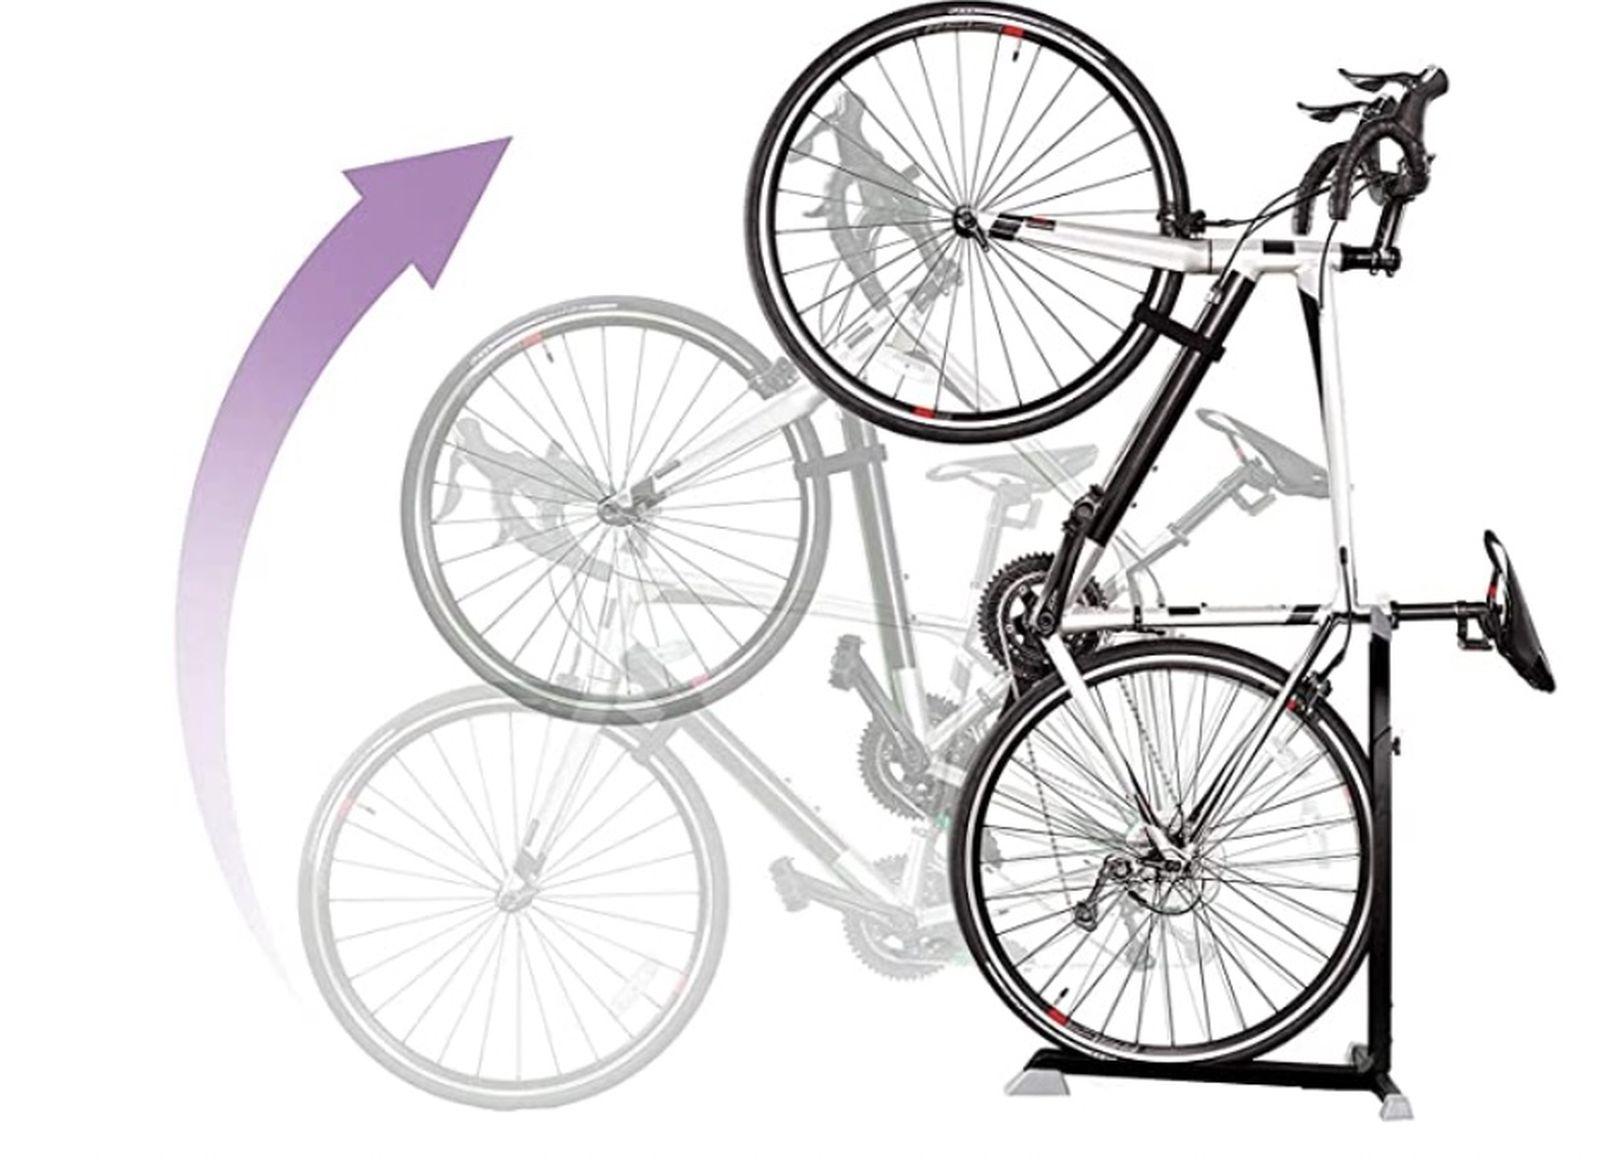 nook bike stand best back to school bike accessories